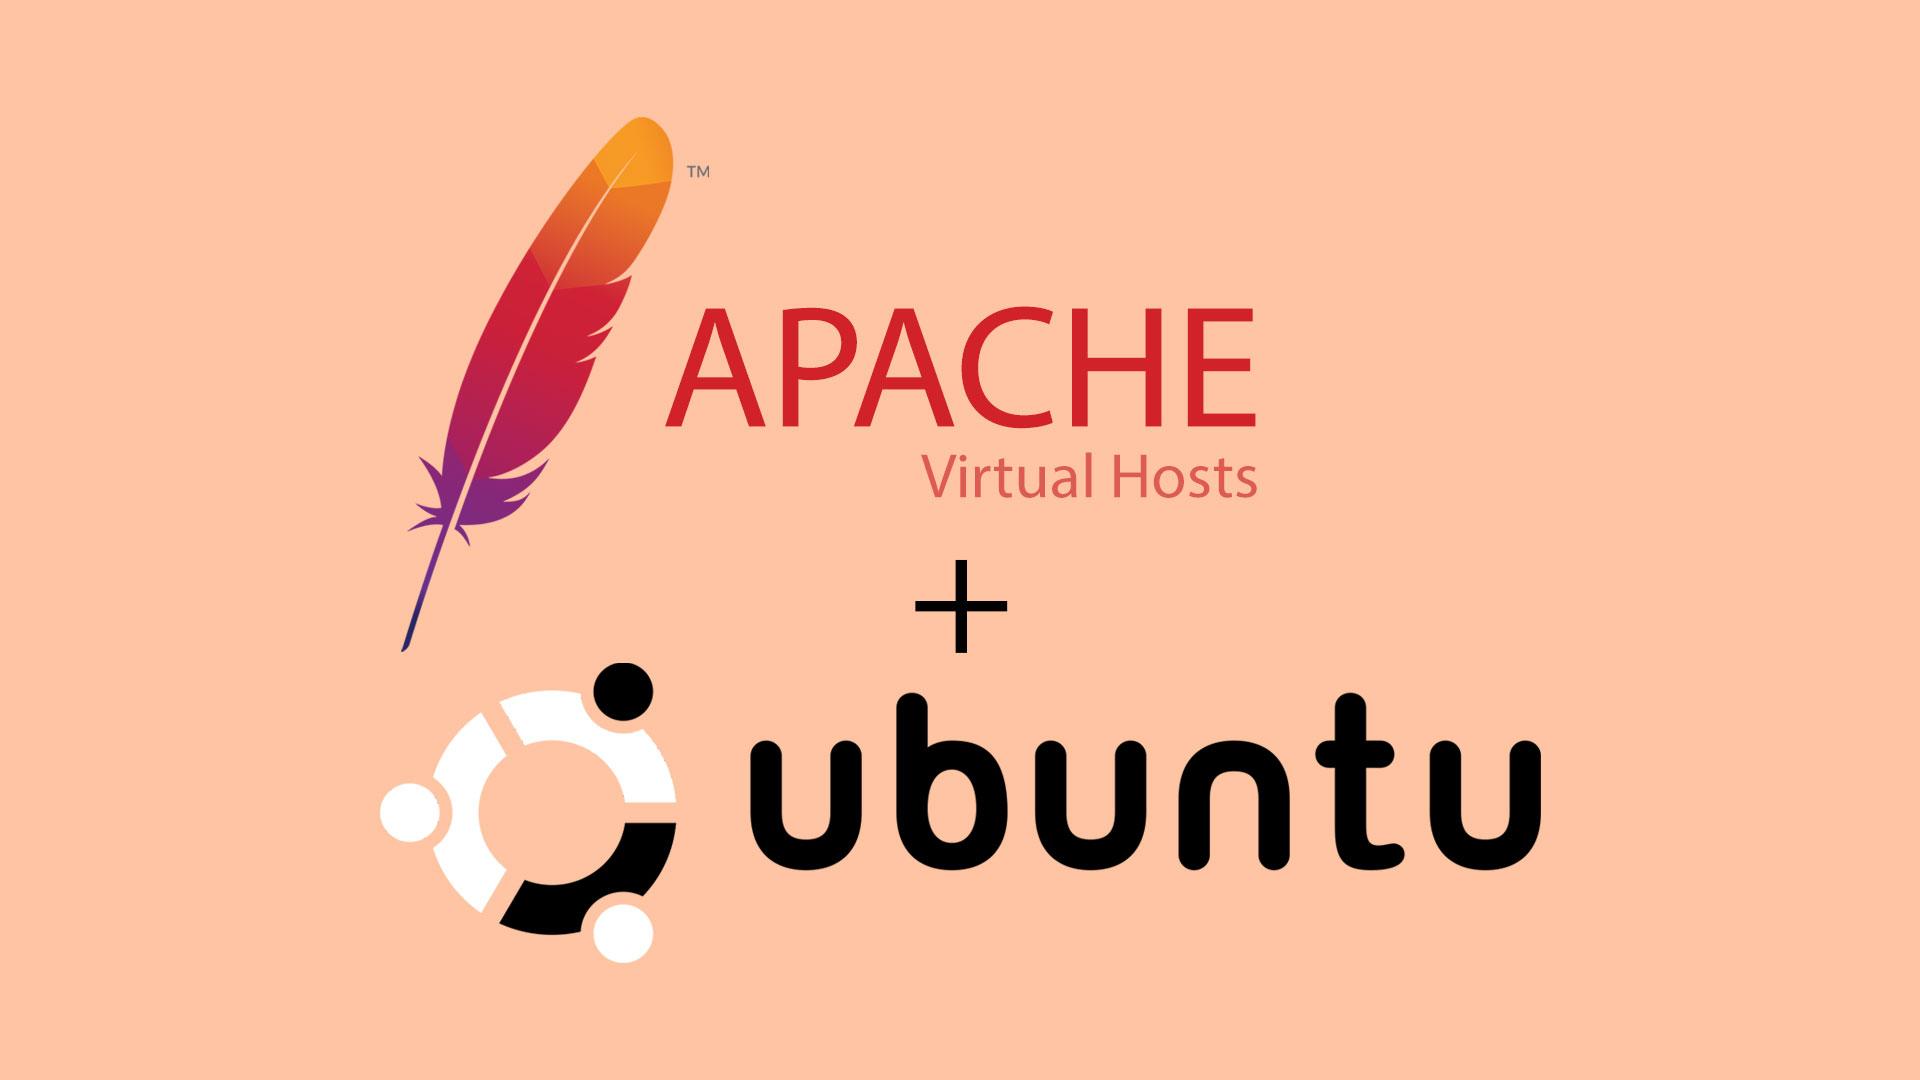 How To Set Up Apache2 Virtual Hosts on Ubuntu 16.04 / 18.04 / 18.10